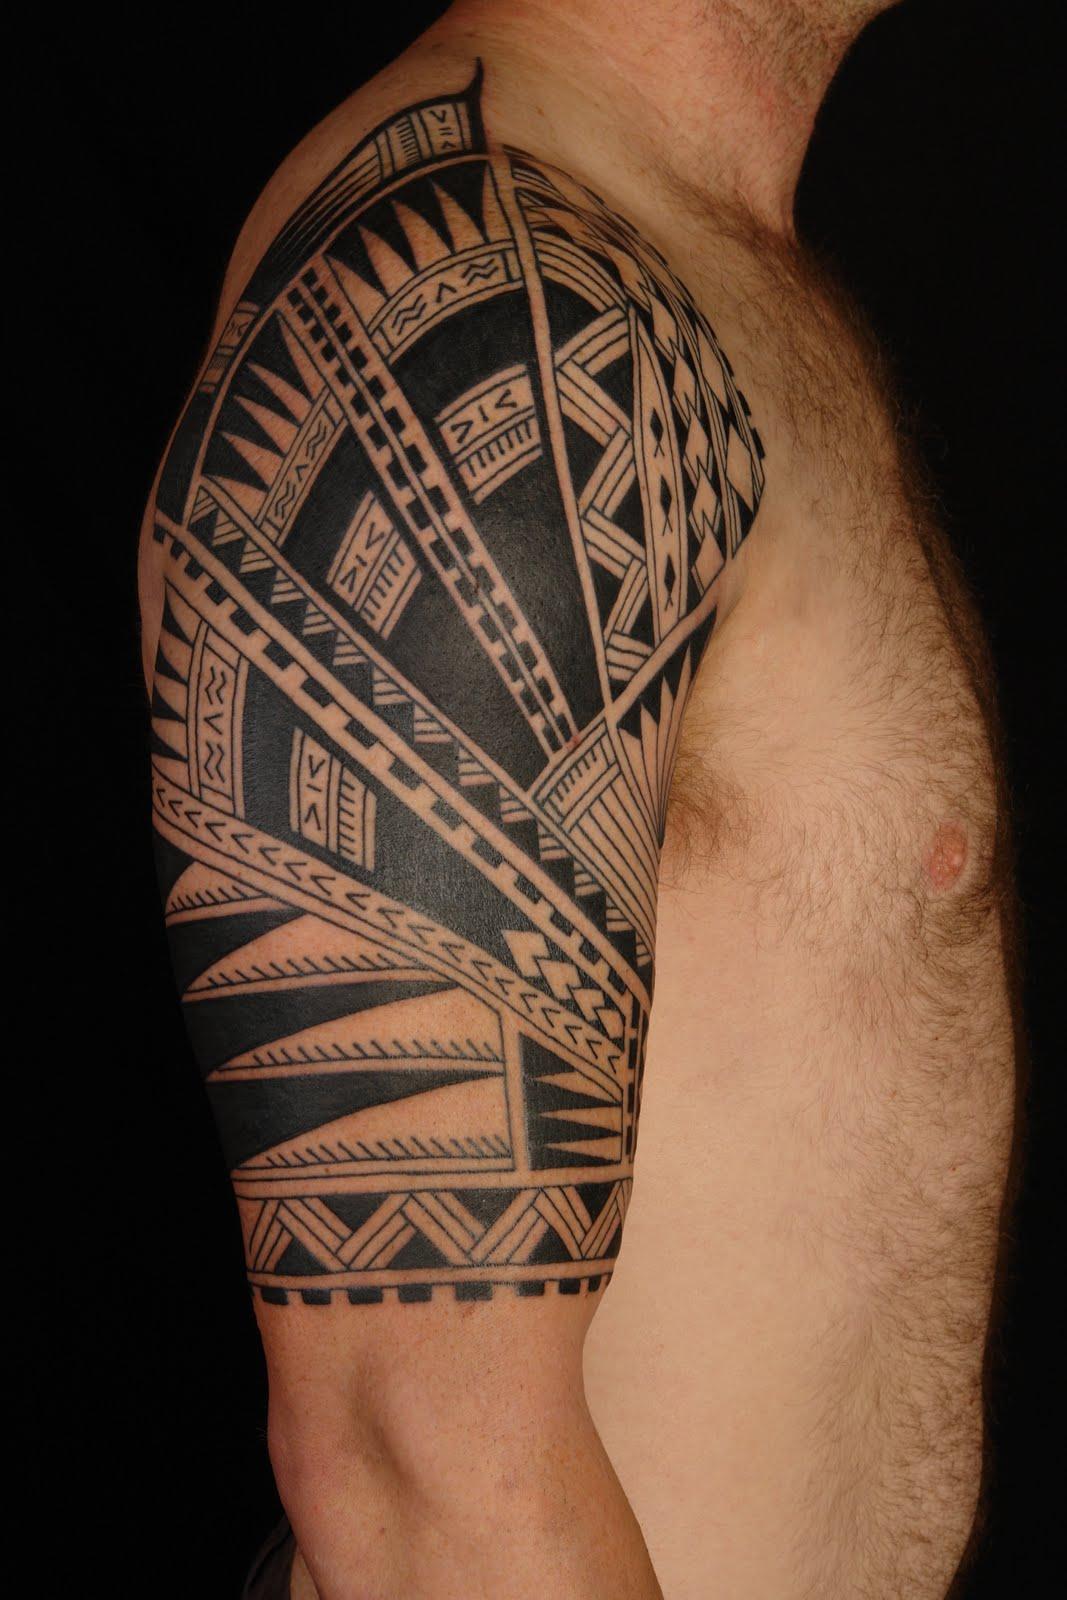 Tatouage Tour De Bras Polynesien - Tatouage homme tour de bras